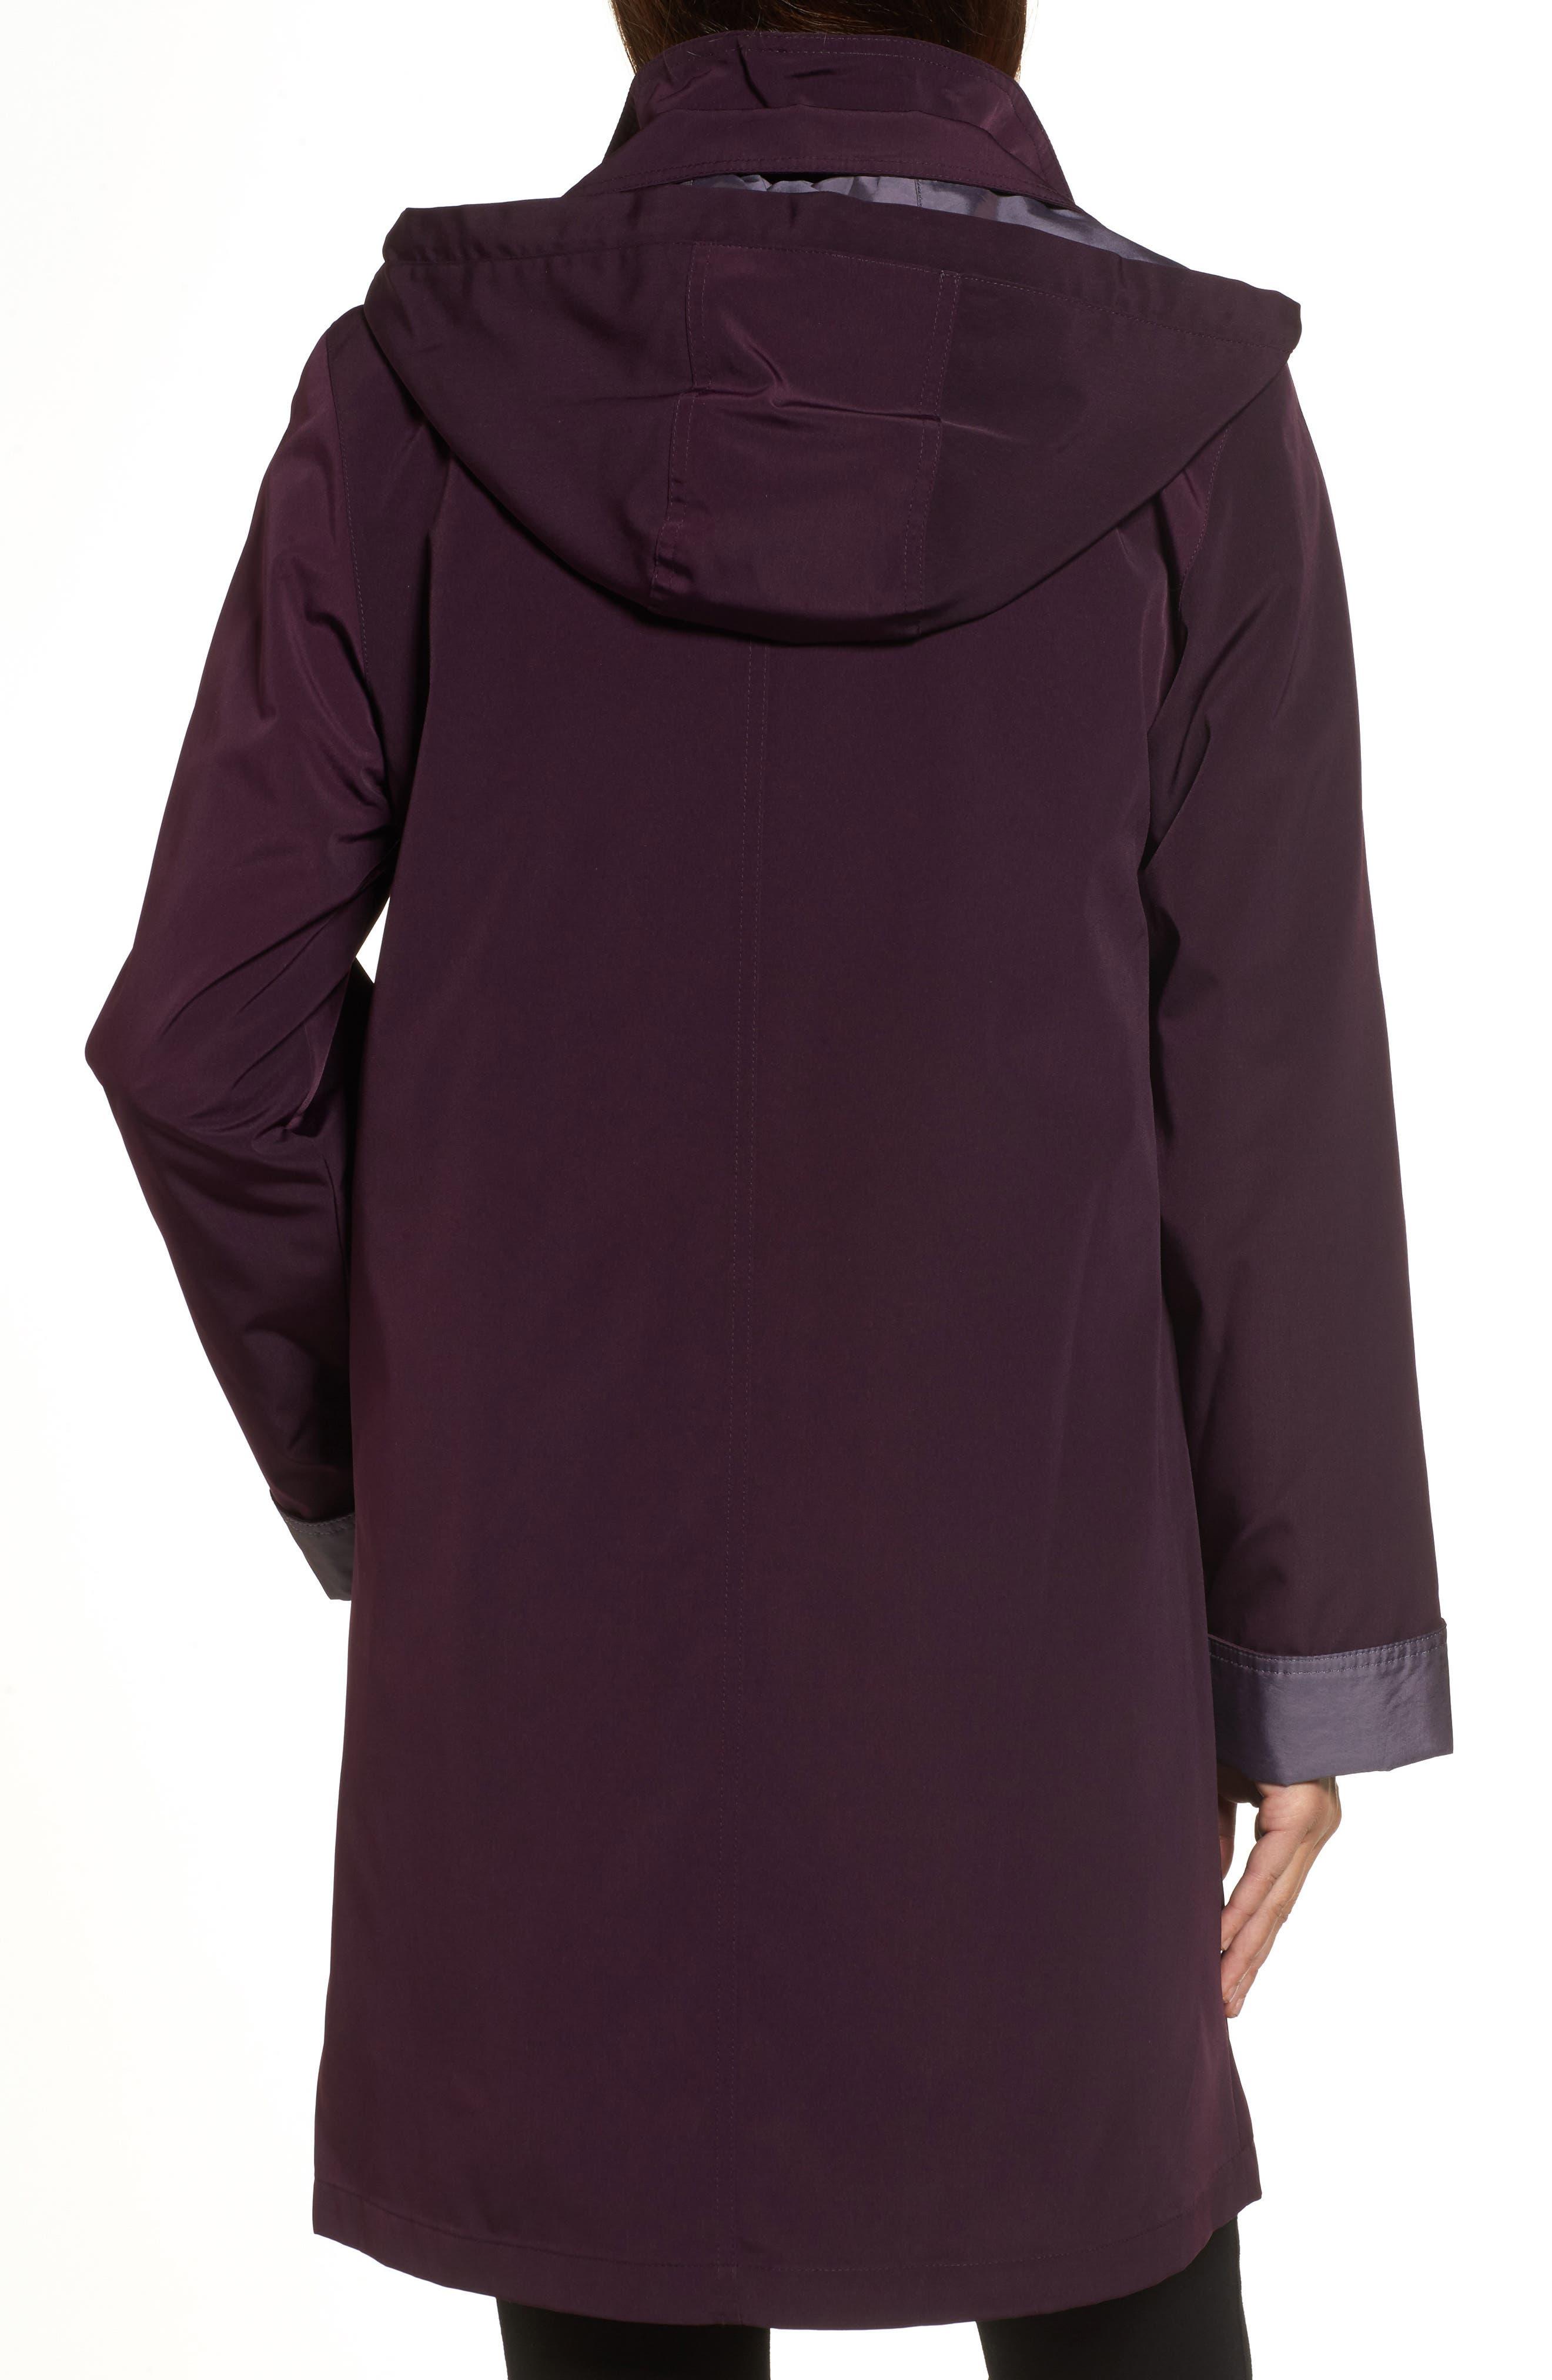 A-Line Raincoat with Detachable Hood & Liner,                             Alternate thumbnail 2, color,                             Blackberry